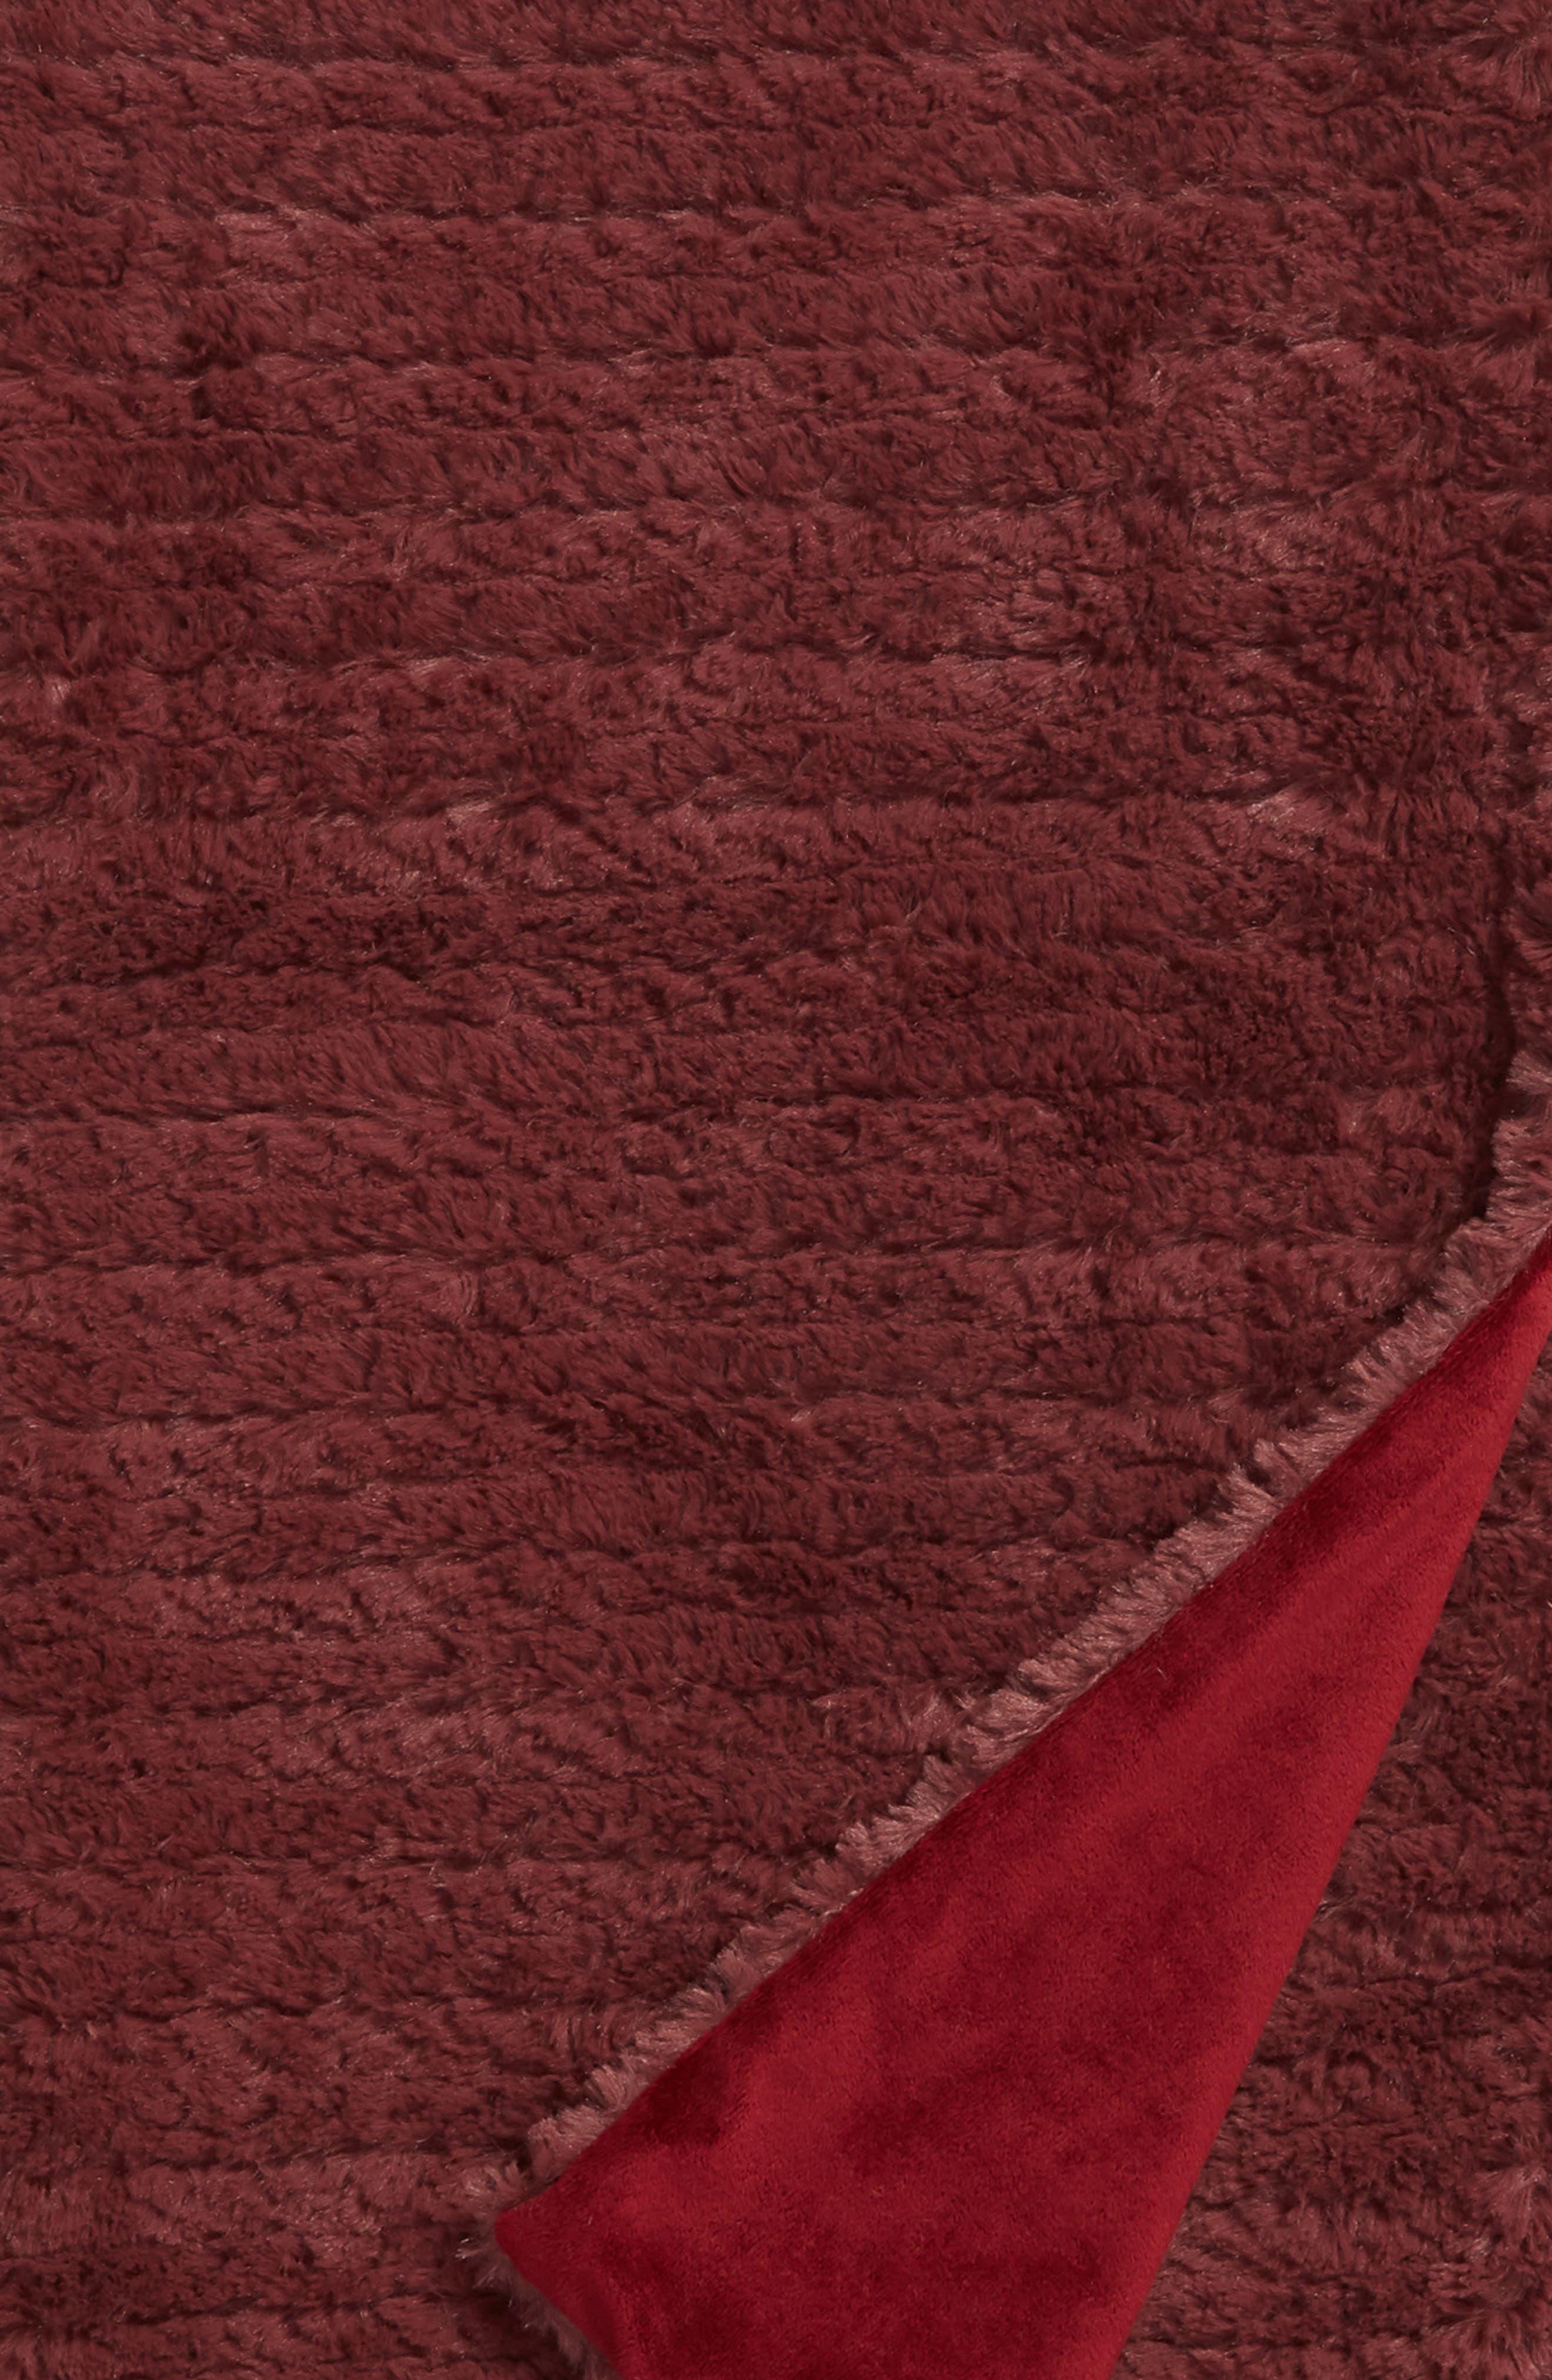 NORDSTROM AT HOME,                             Faux Fur Throw Blanket,                             Alternate thumbnail 2, color,                             BURGUNDY GINGER